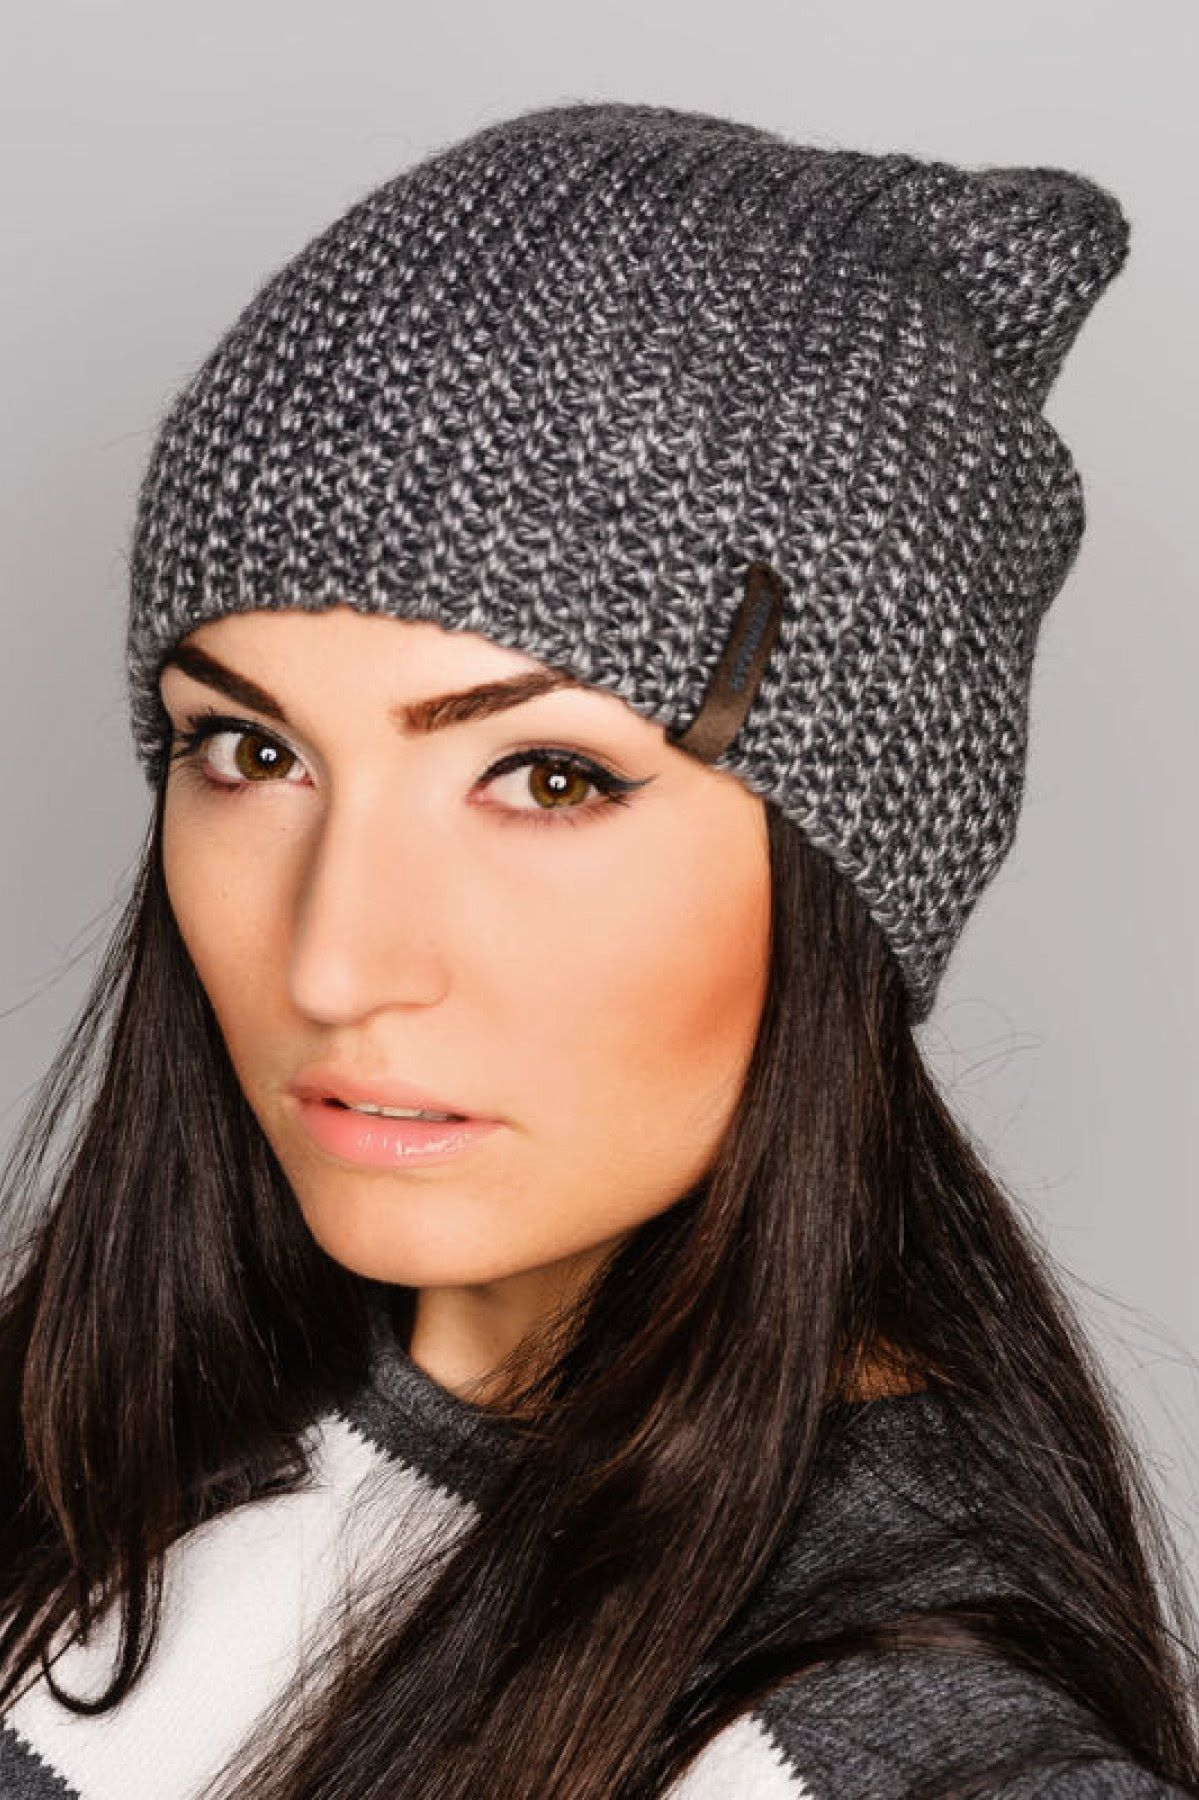 Вязание спицами шапки чулок женские